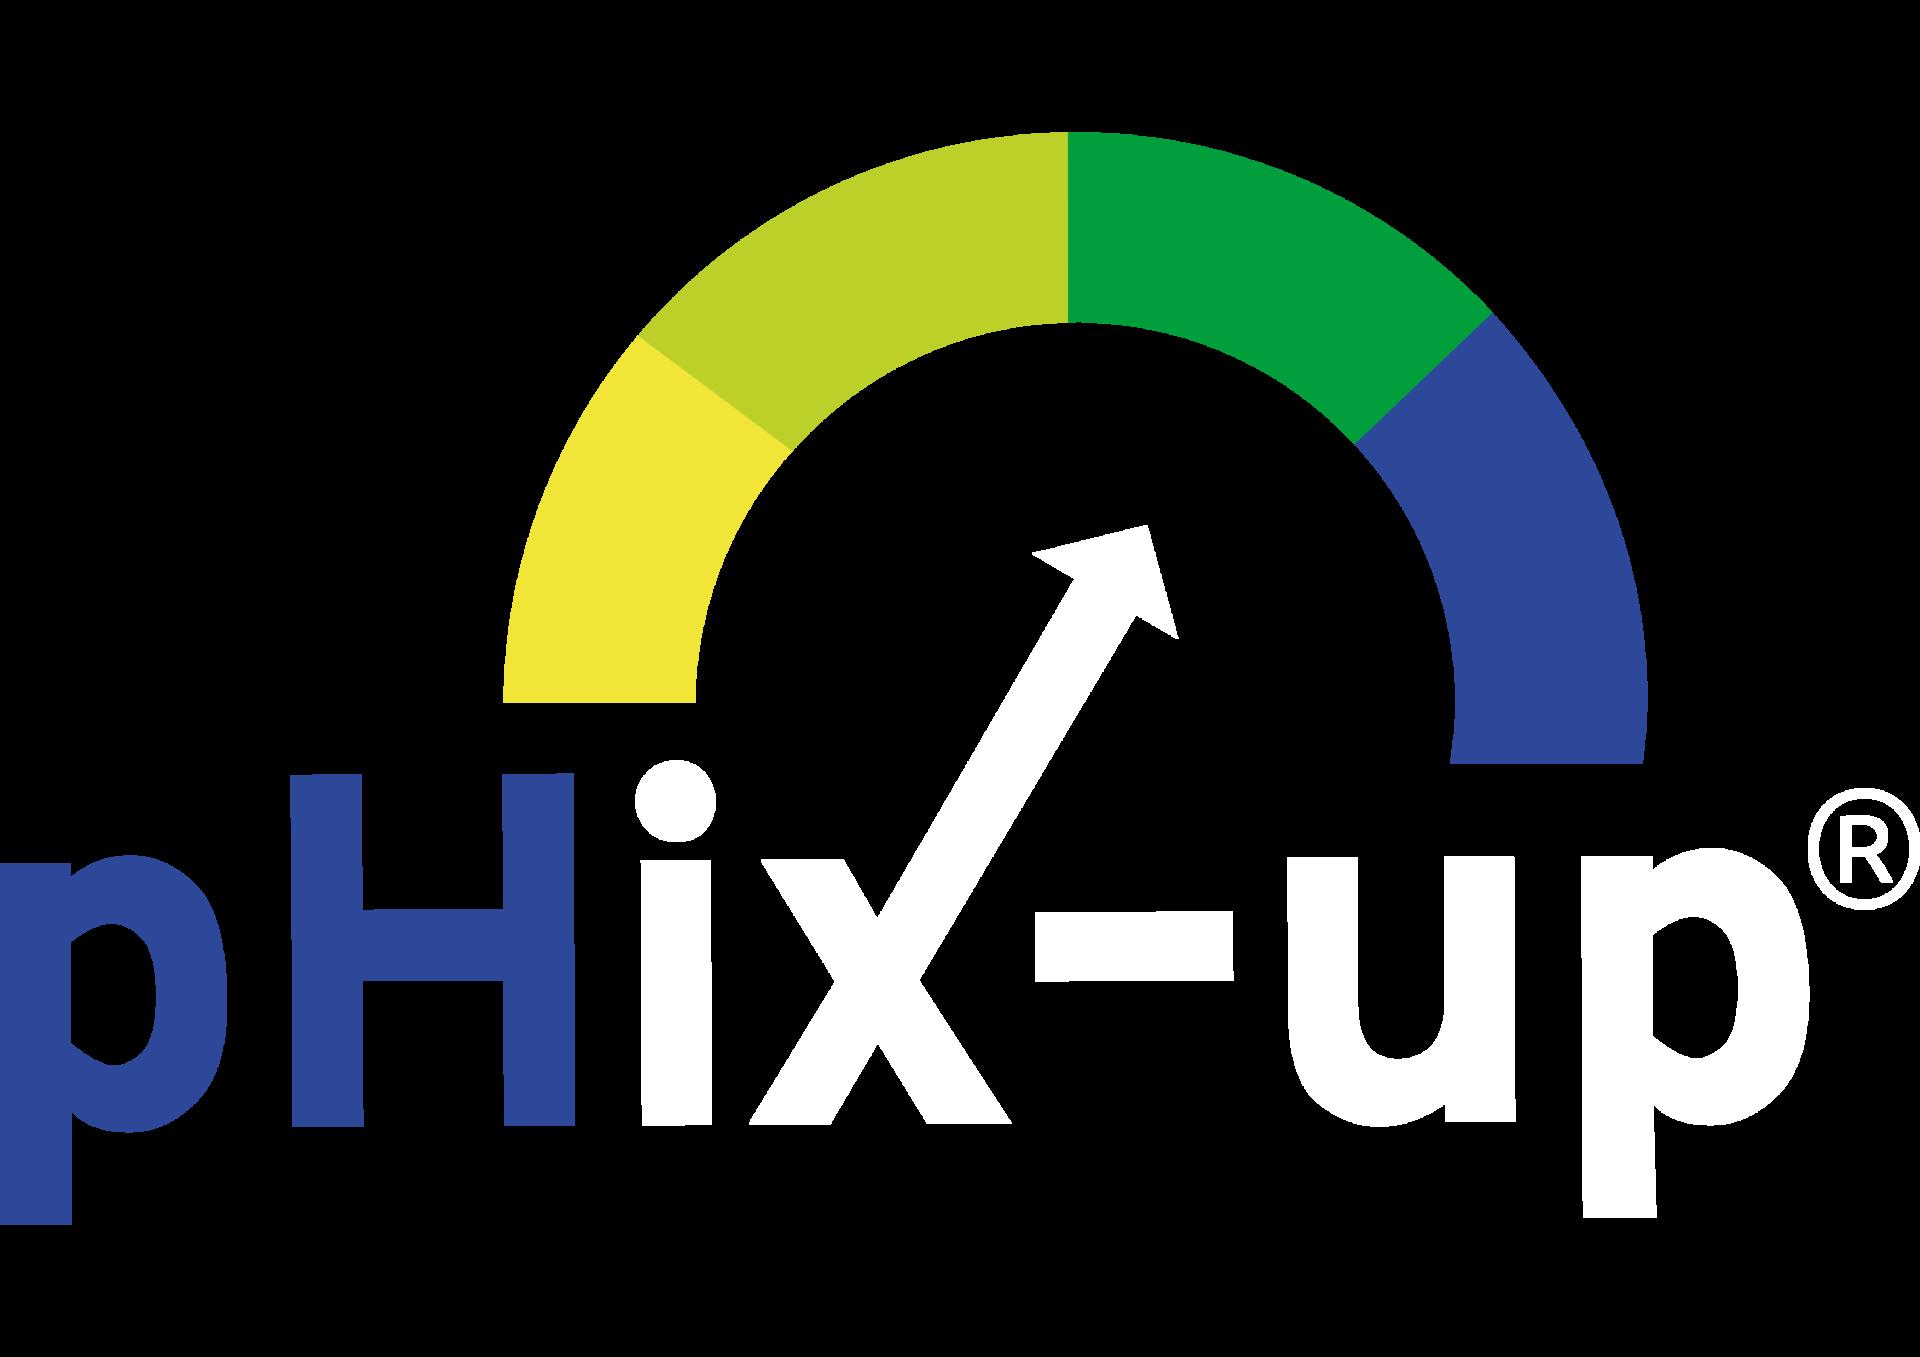 Logo pHix-up